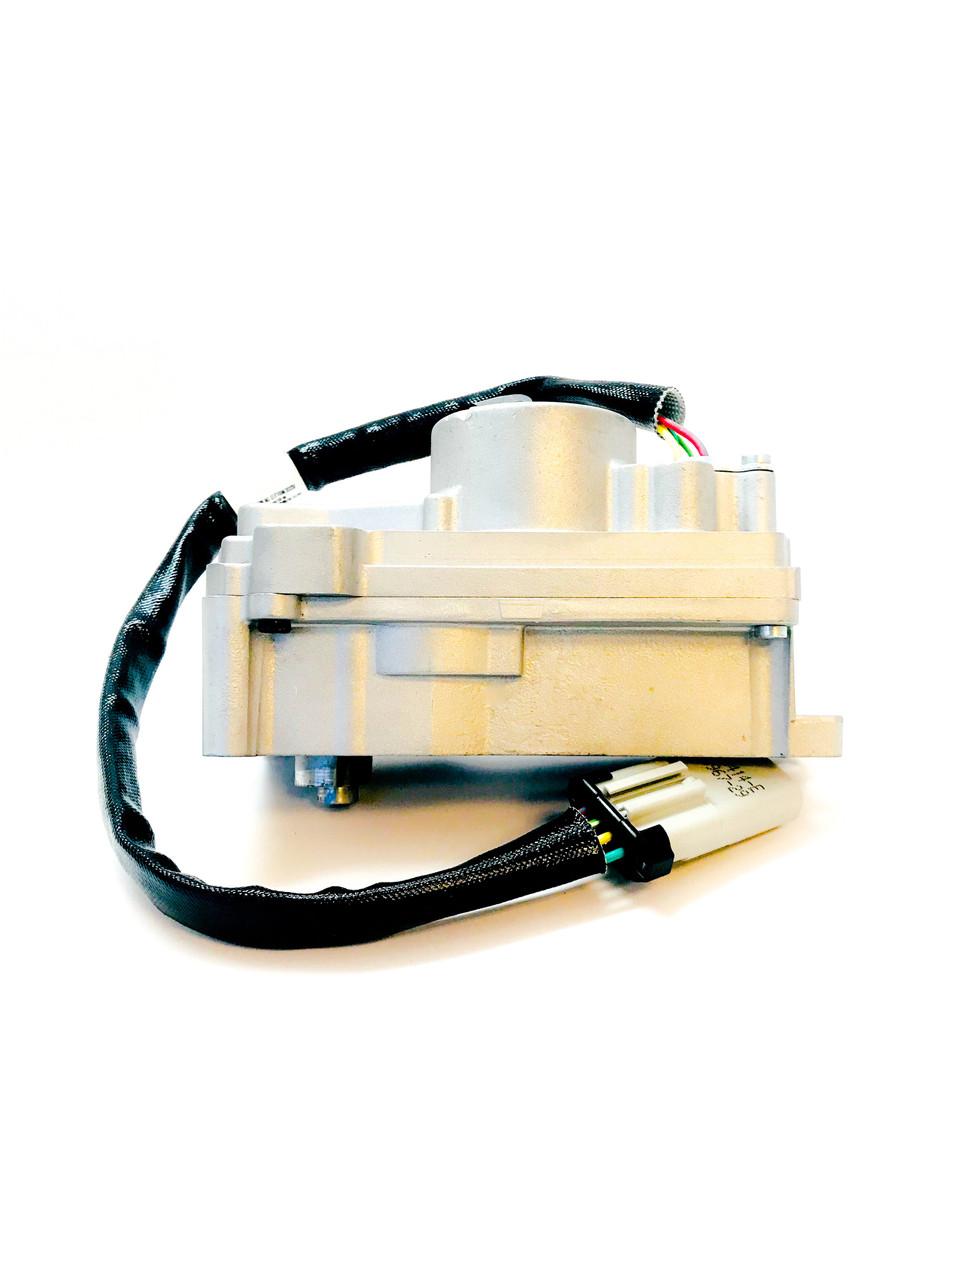 Faulty Electronic Turbo Actuator Symptoms